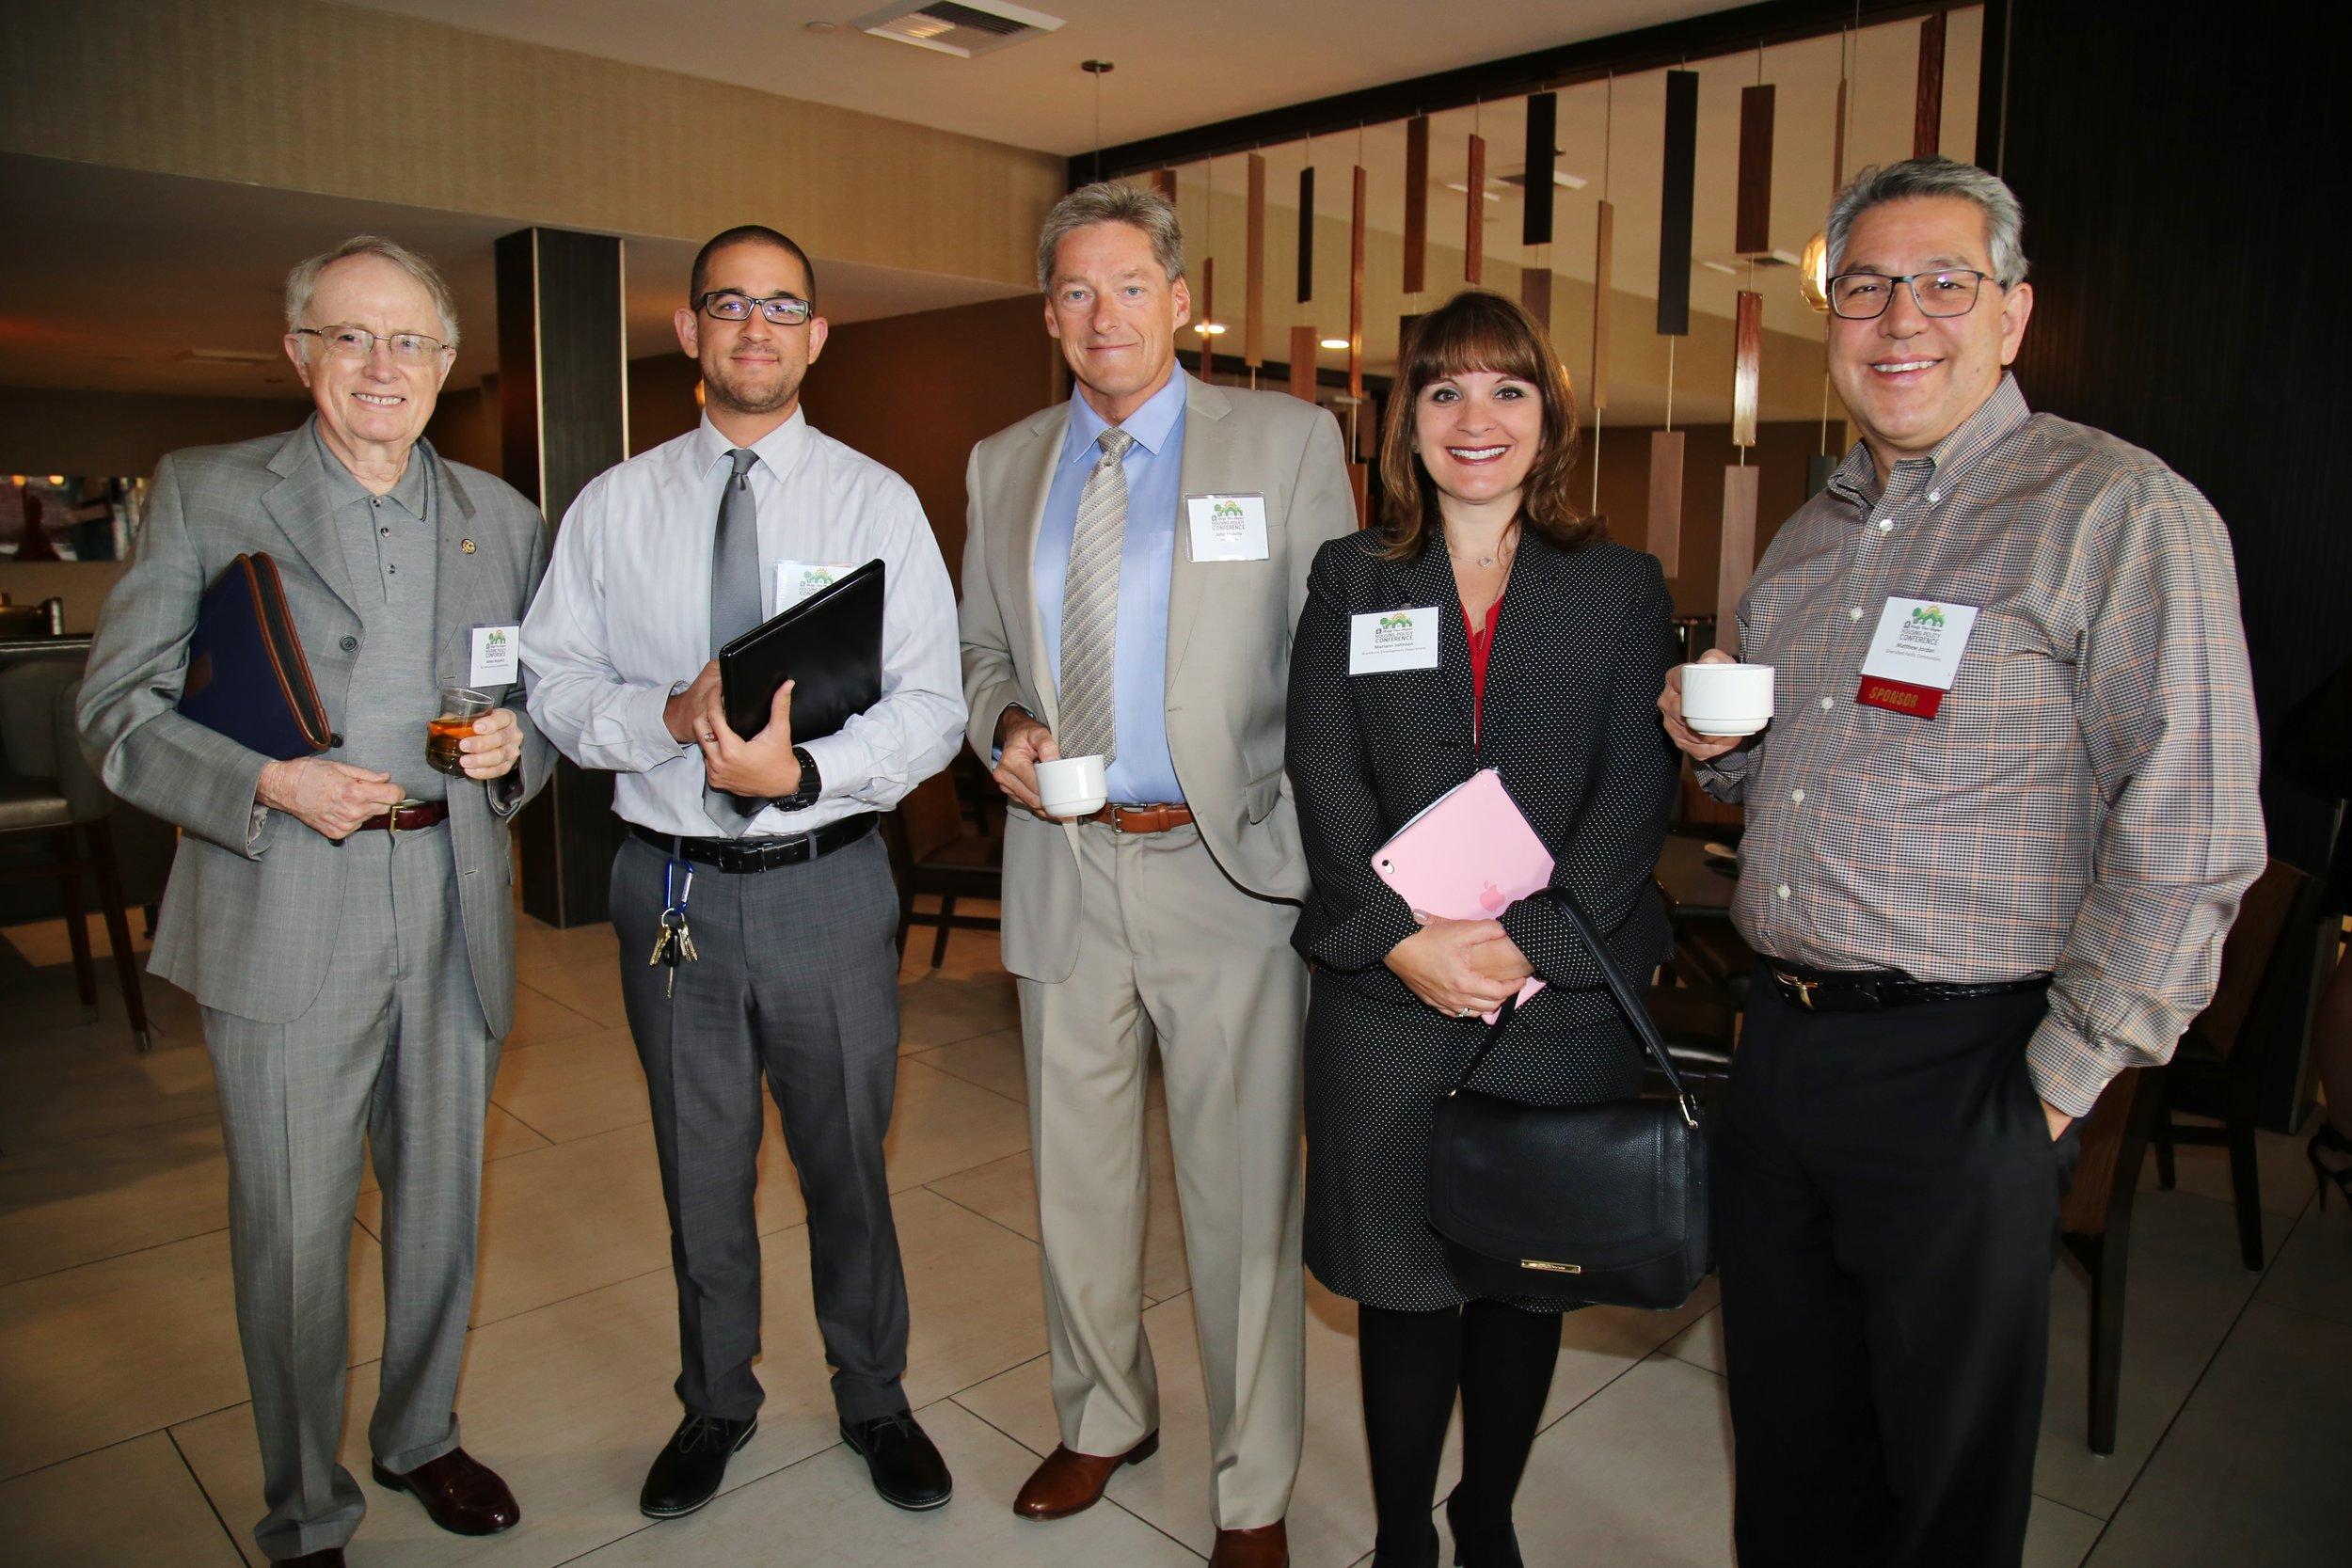 (From left to right) San Bernardino Councilmember James Mulvihill, panelist Frank Castanos, panelist John Mulville, panelist Mariann Johnson, and former BIABV presdent Matt Jordan.